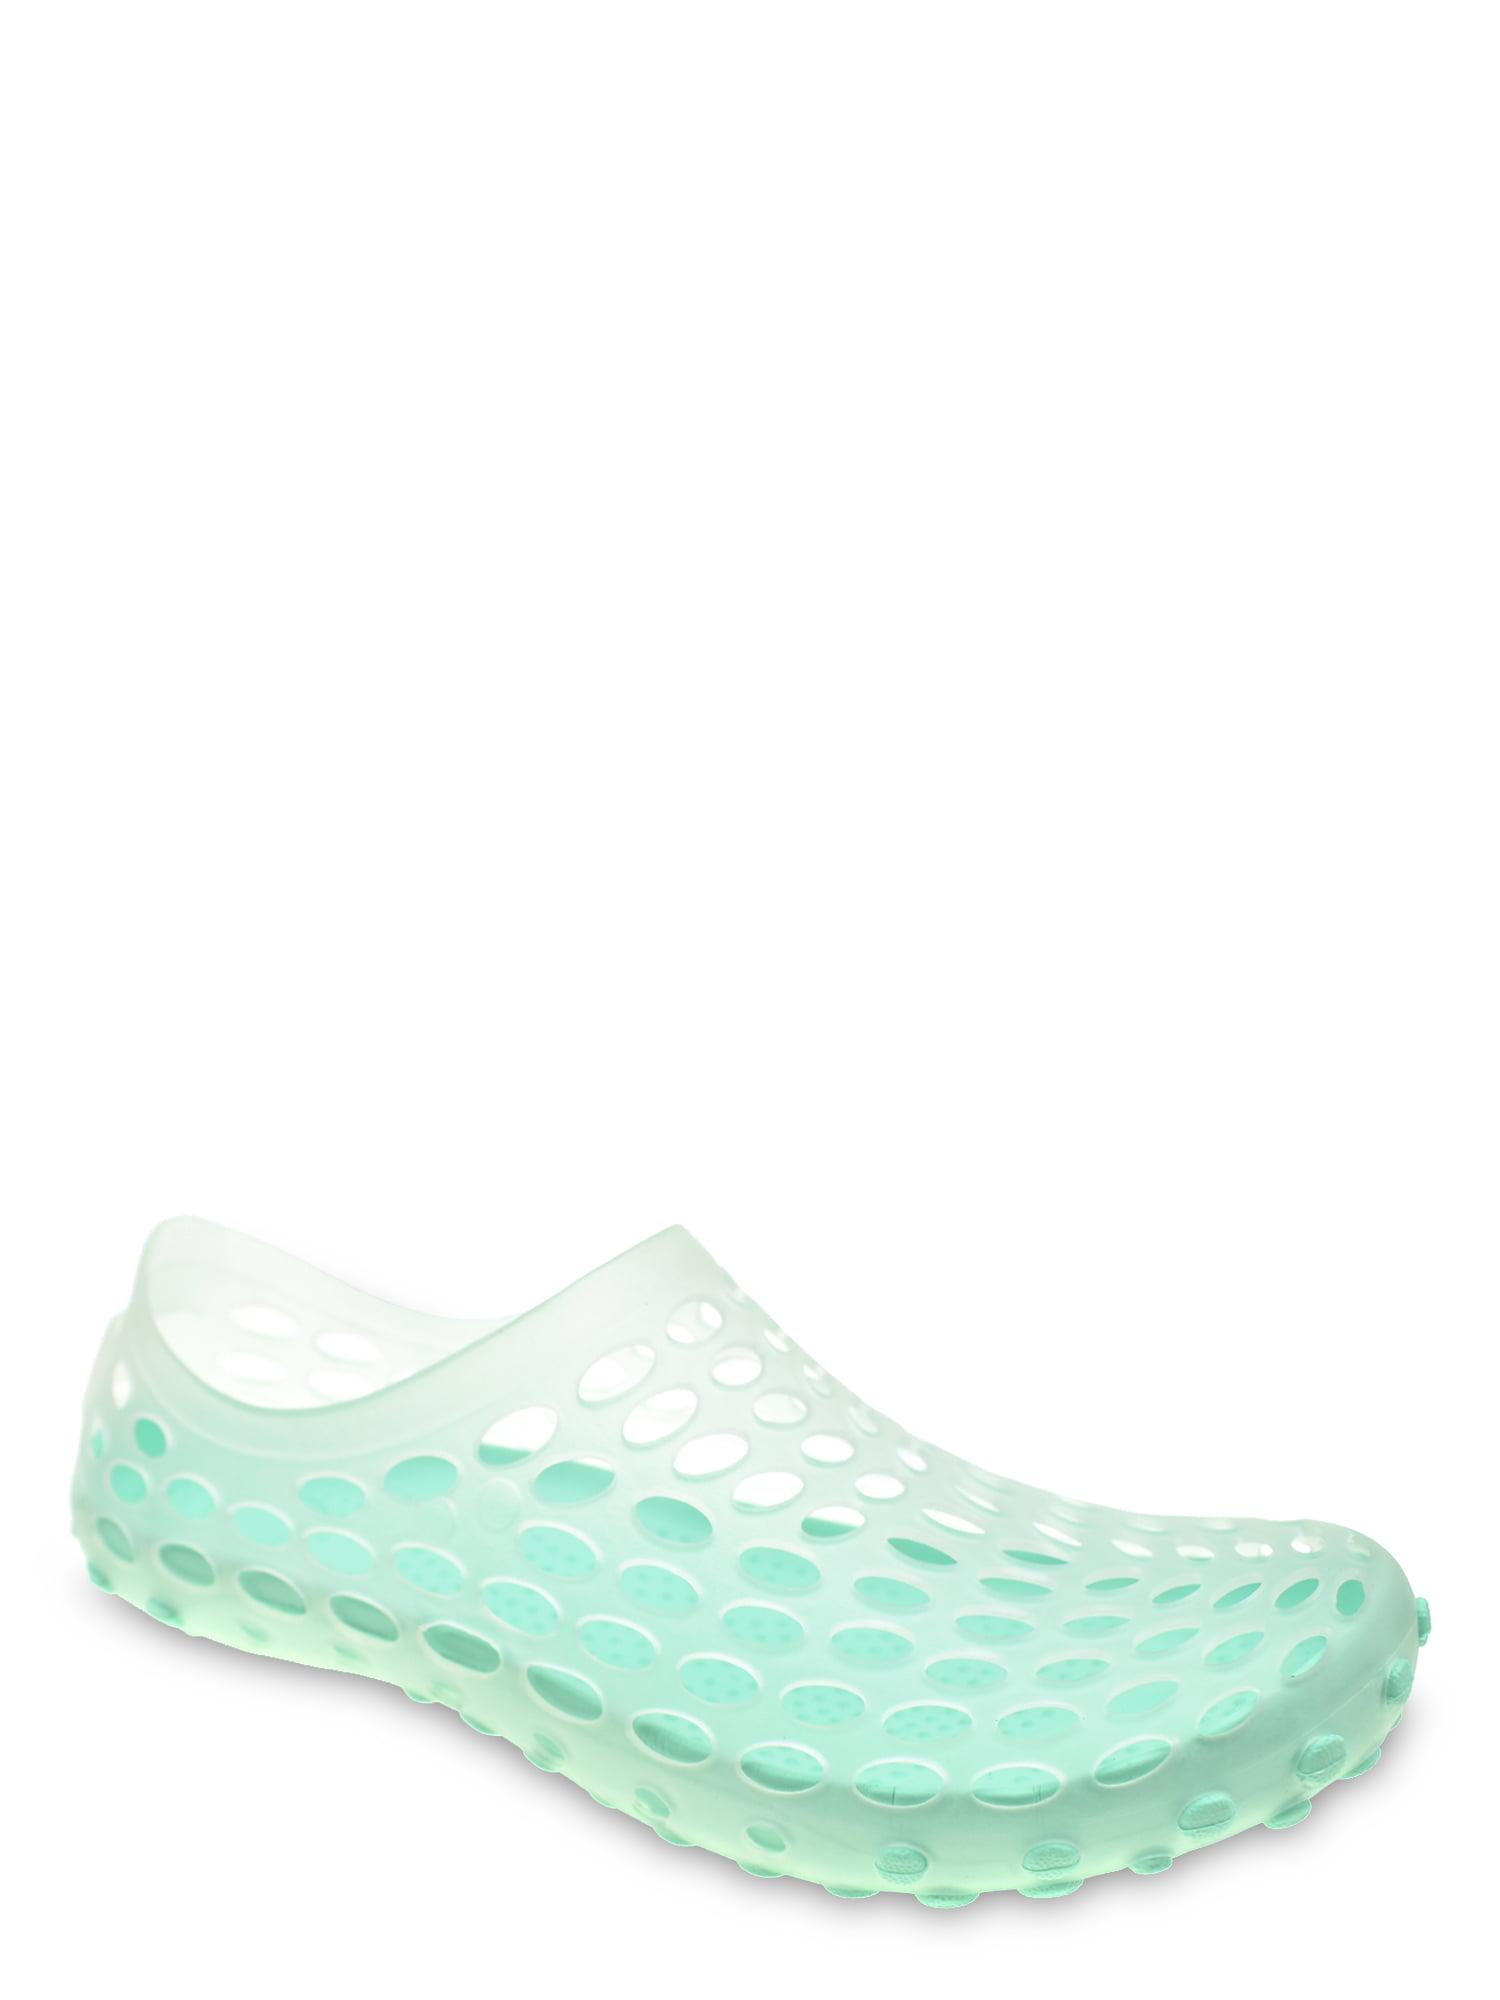 Athletic Works Womens Caged Aqua Shoe